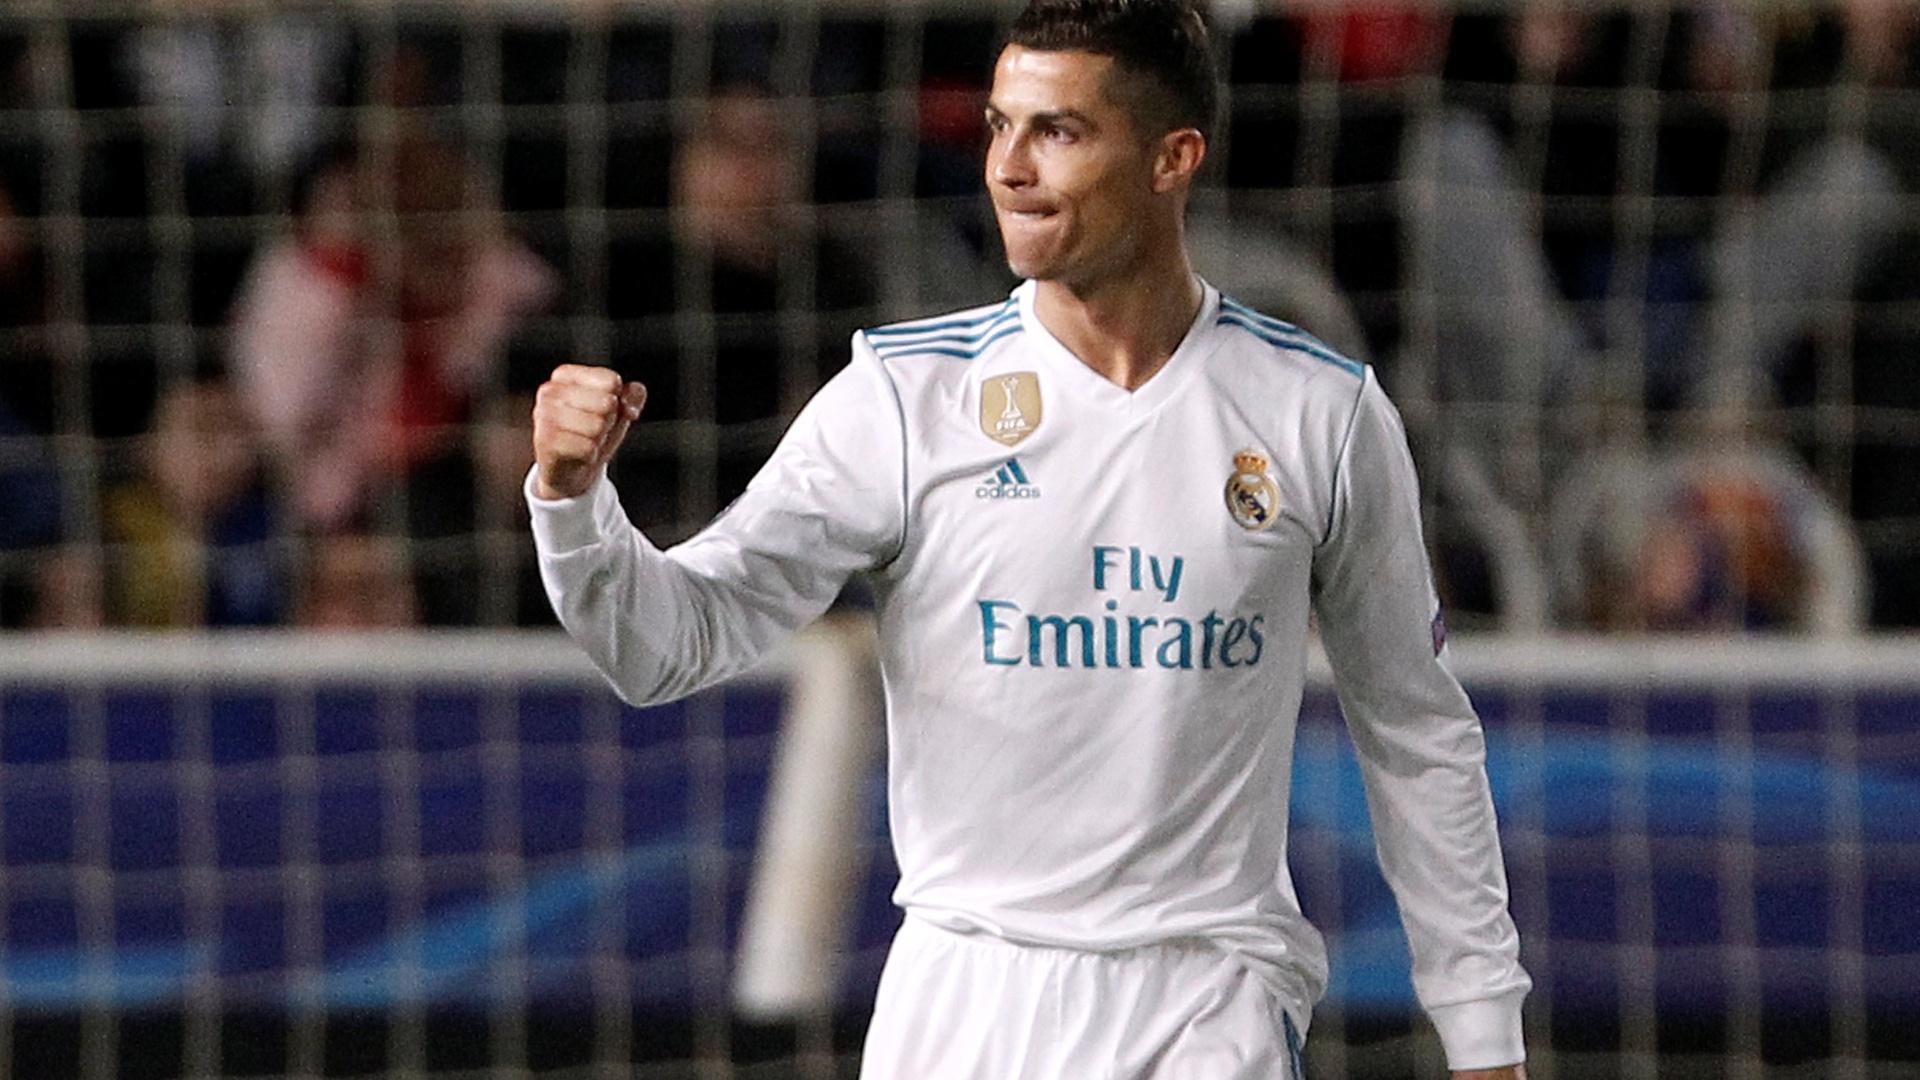 Cristiano Ronaldo comemora gol do Real Madrid contra o Apoel